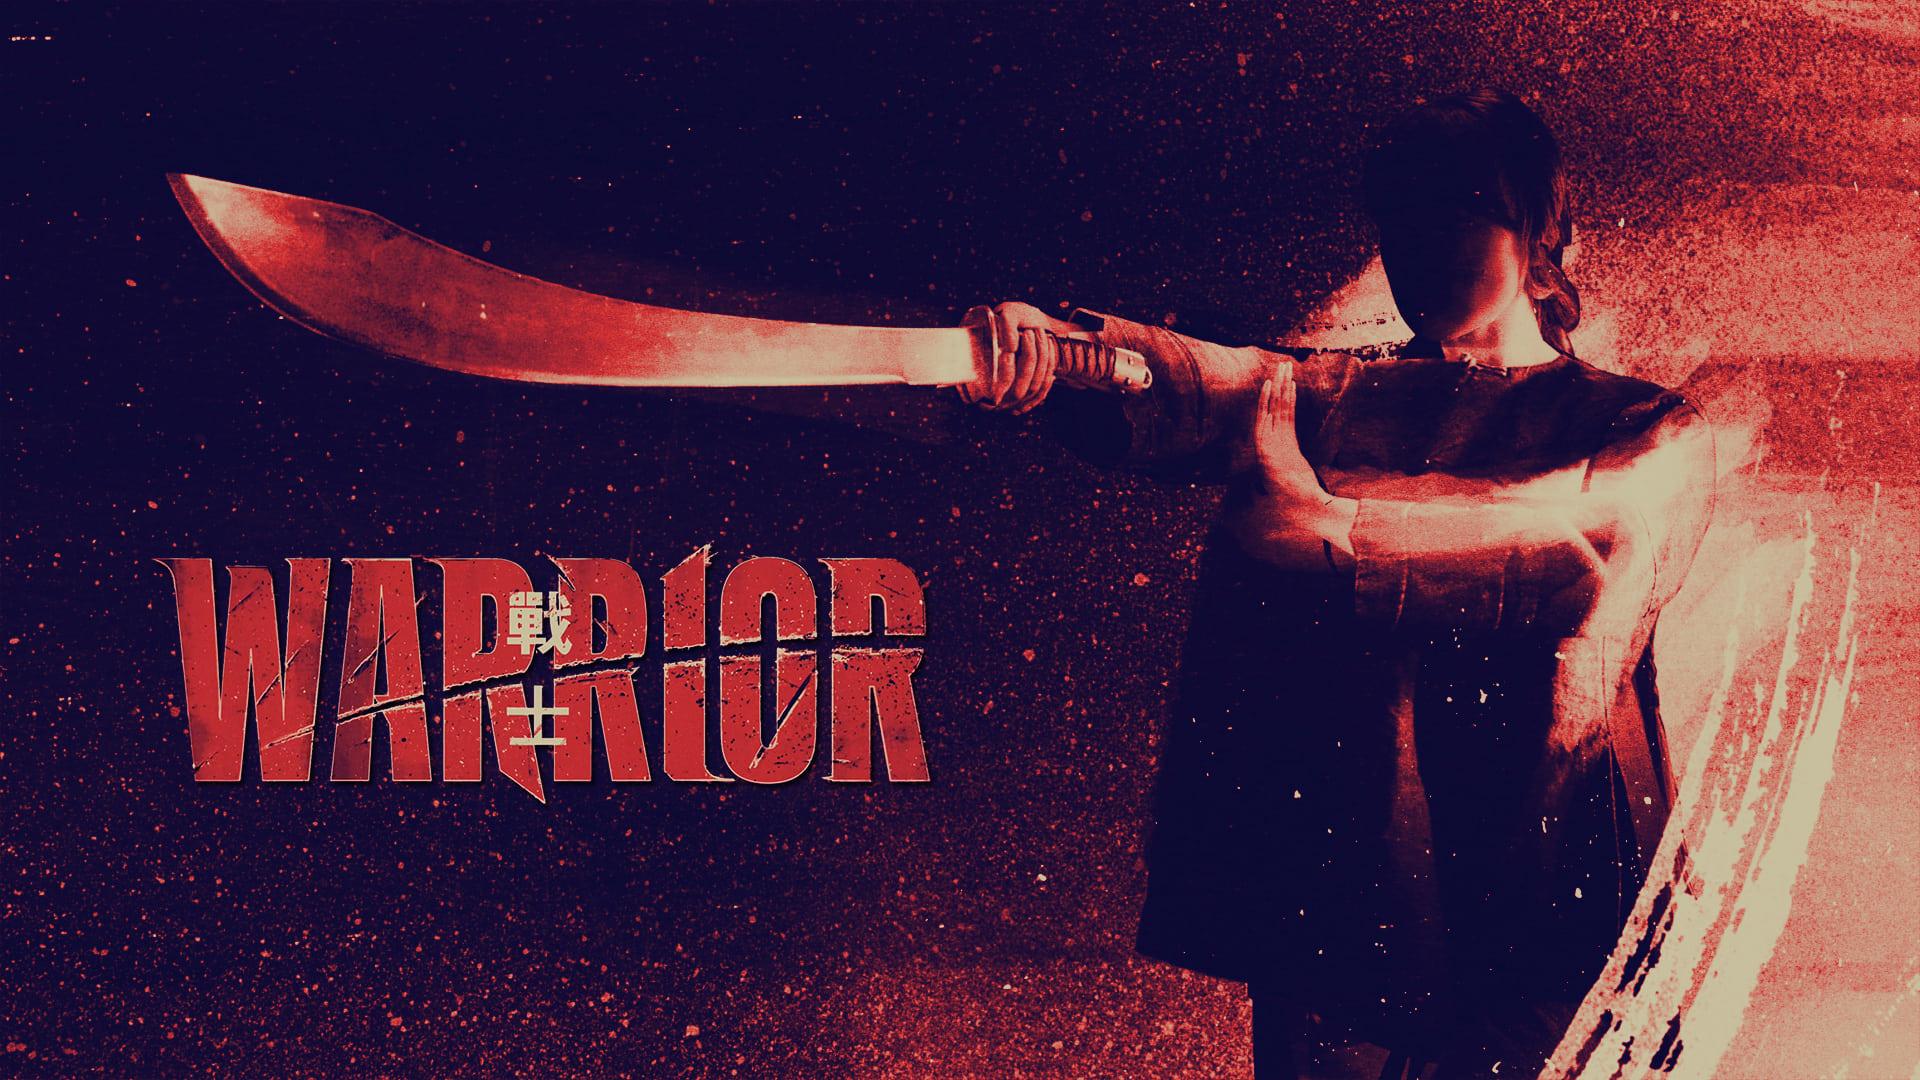 Tweede seizoen Warrior (2019) start begin oktober